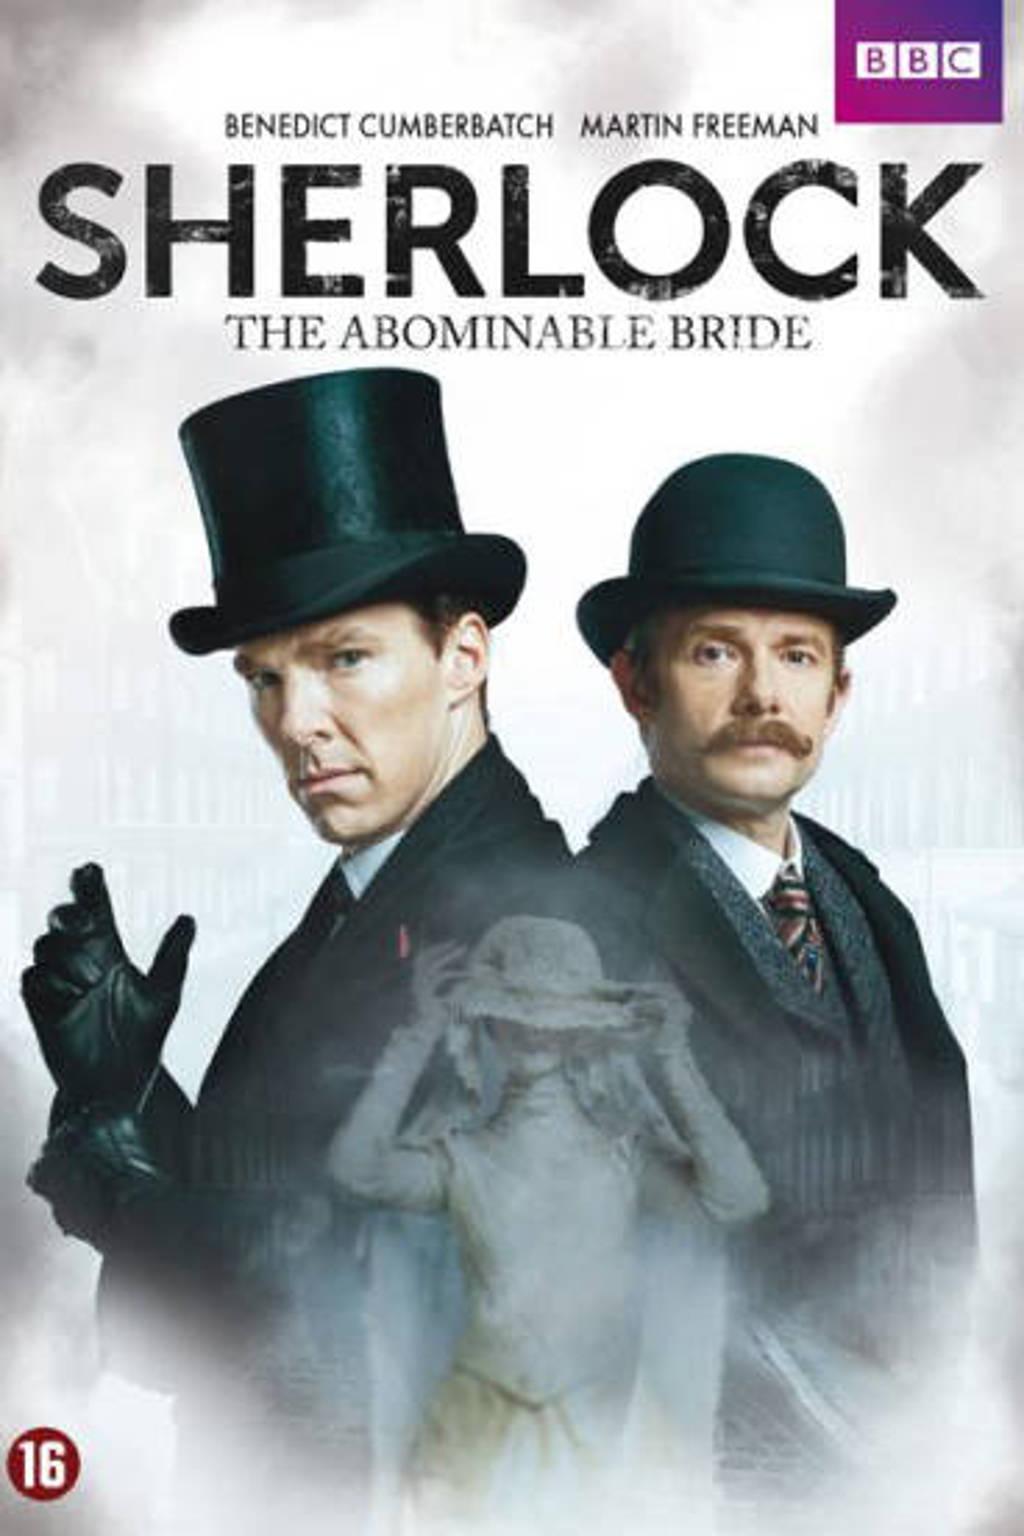 Sherlock - The Abominable Bride (DVD)